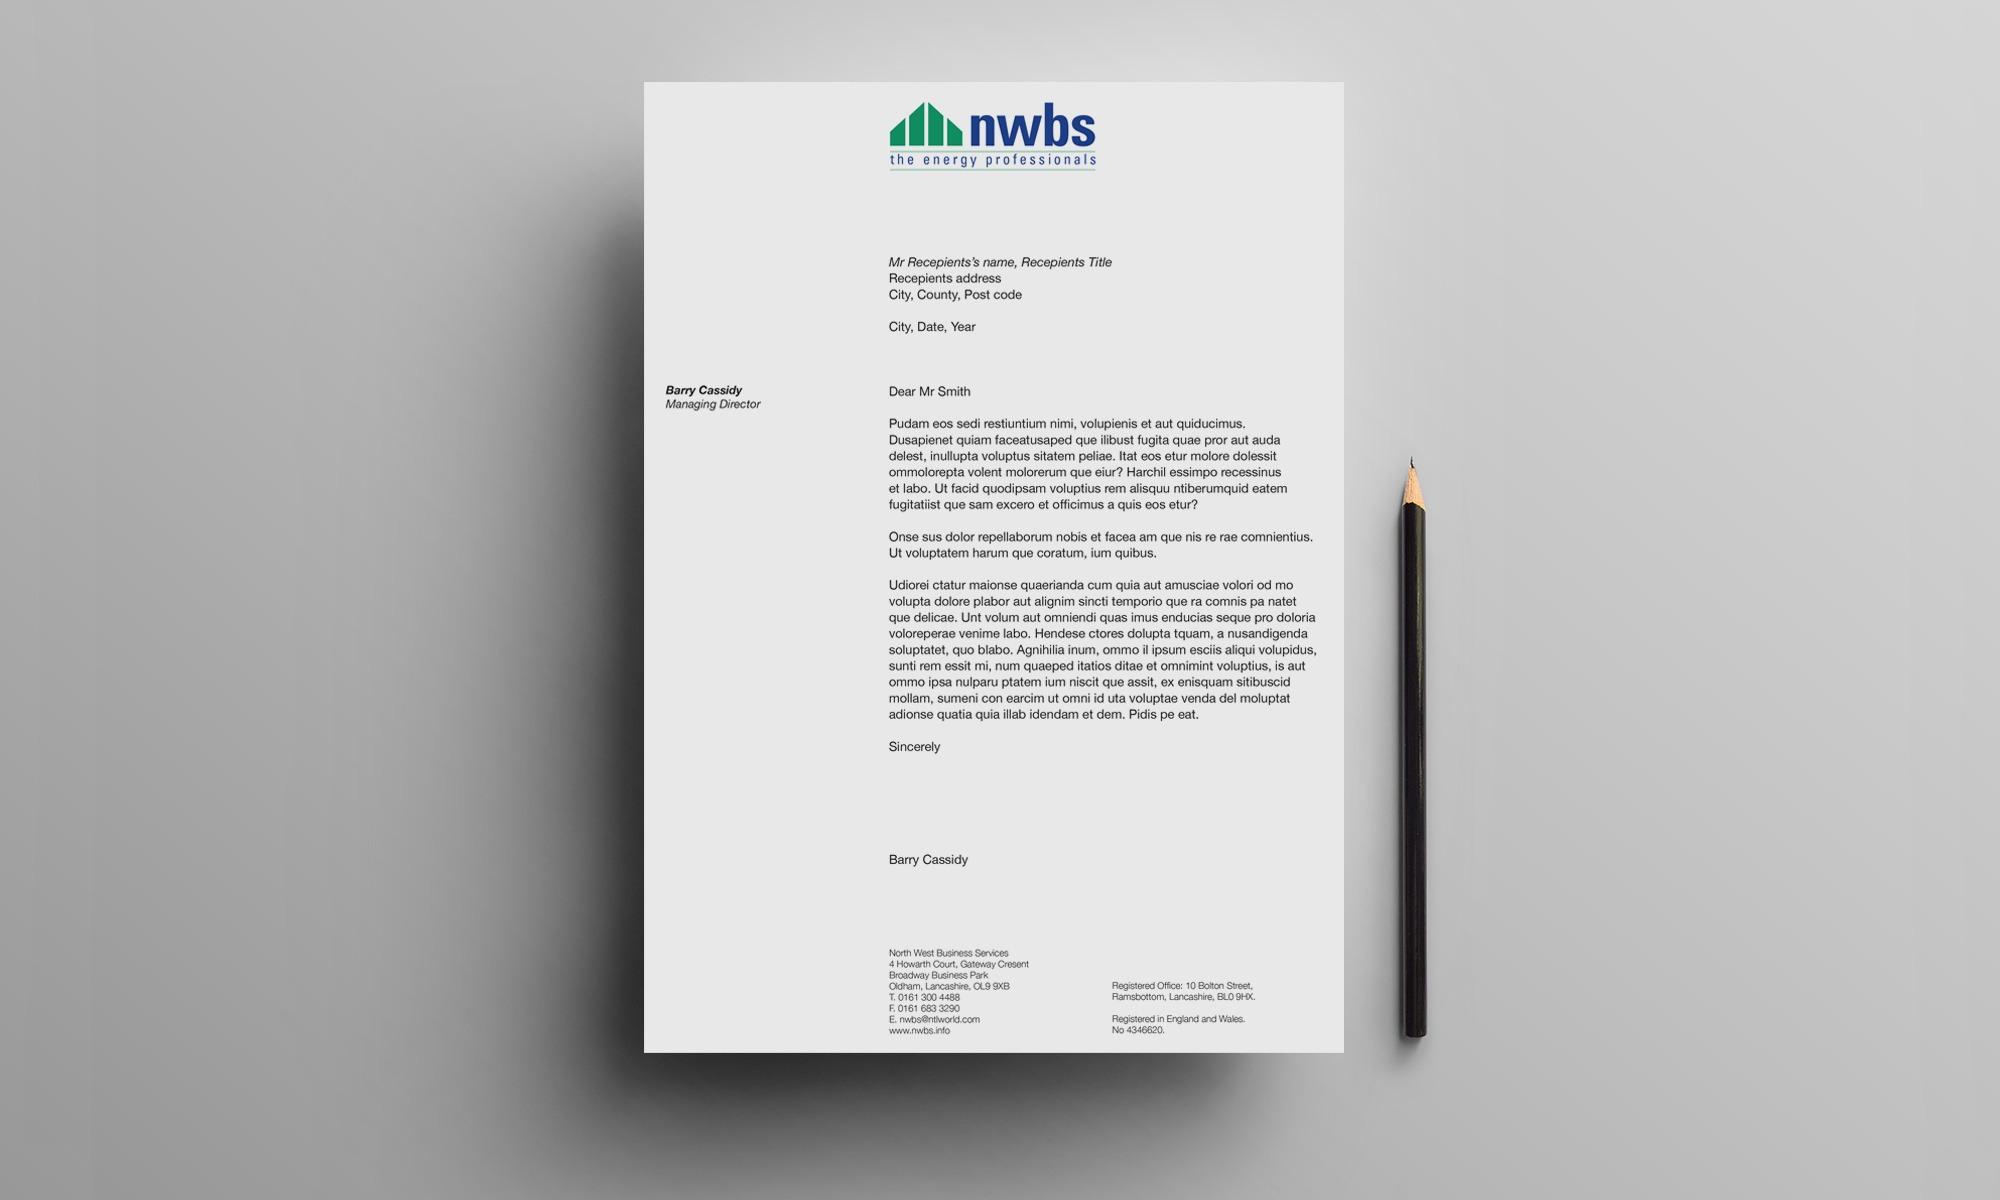 NBWS letter